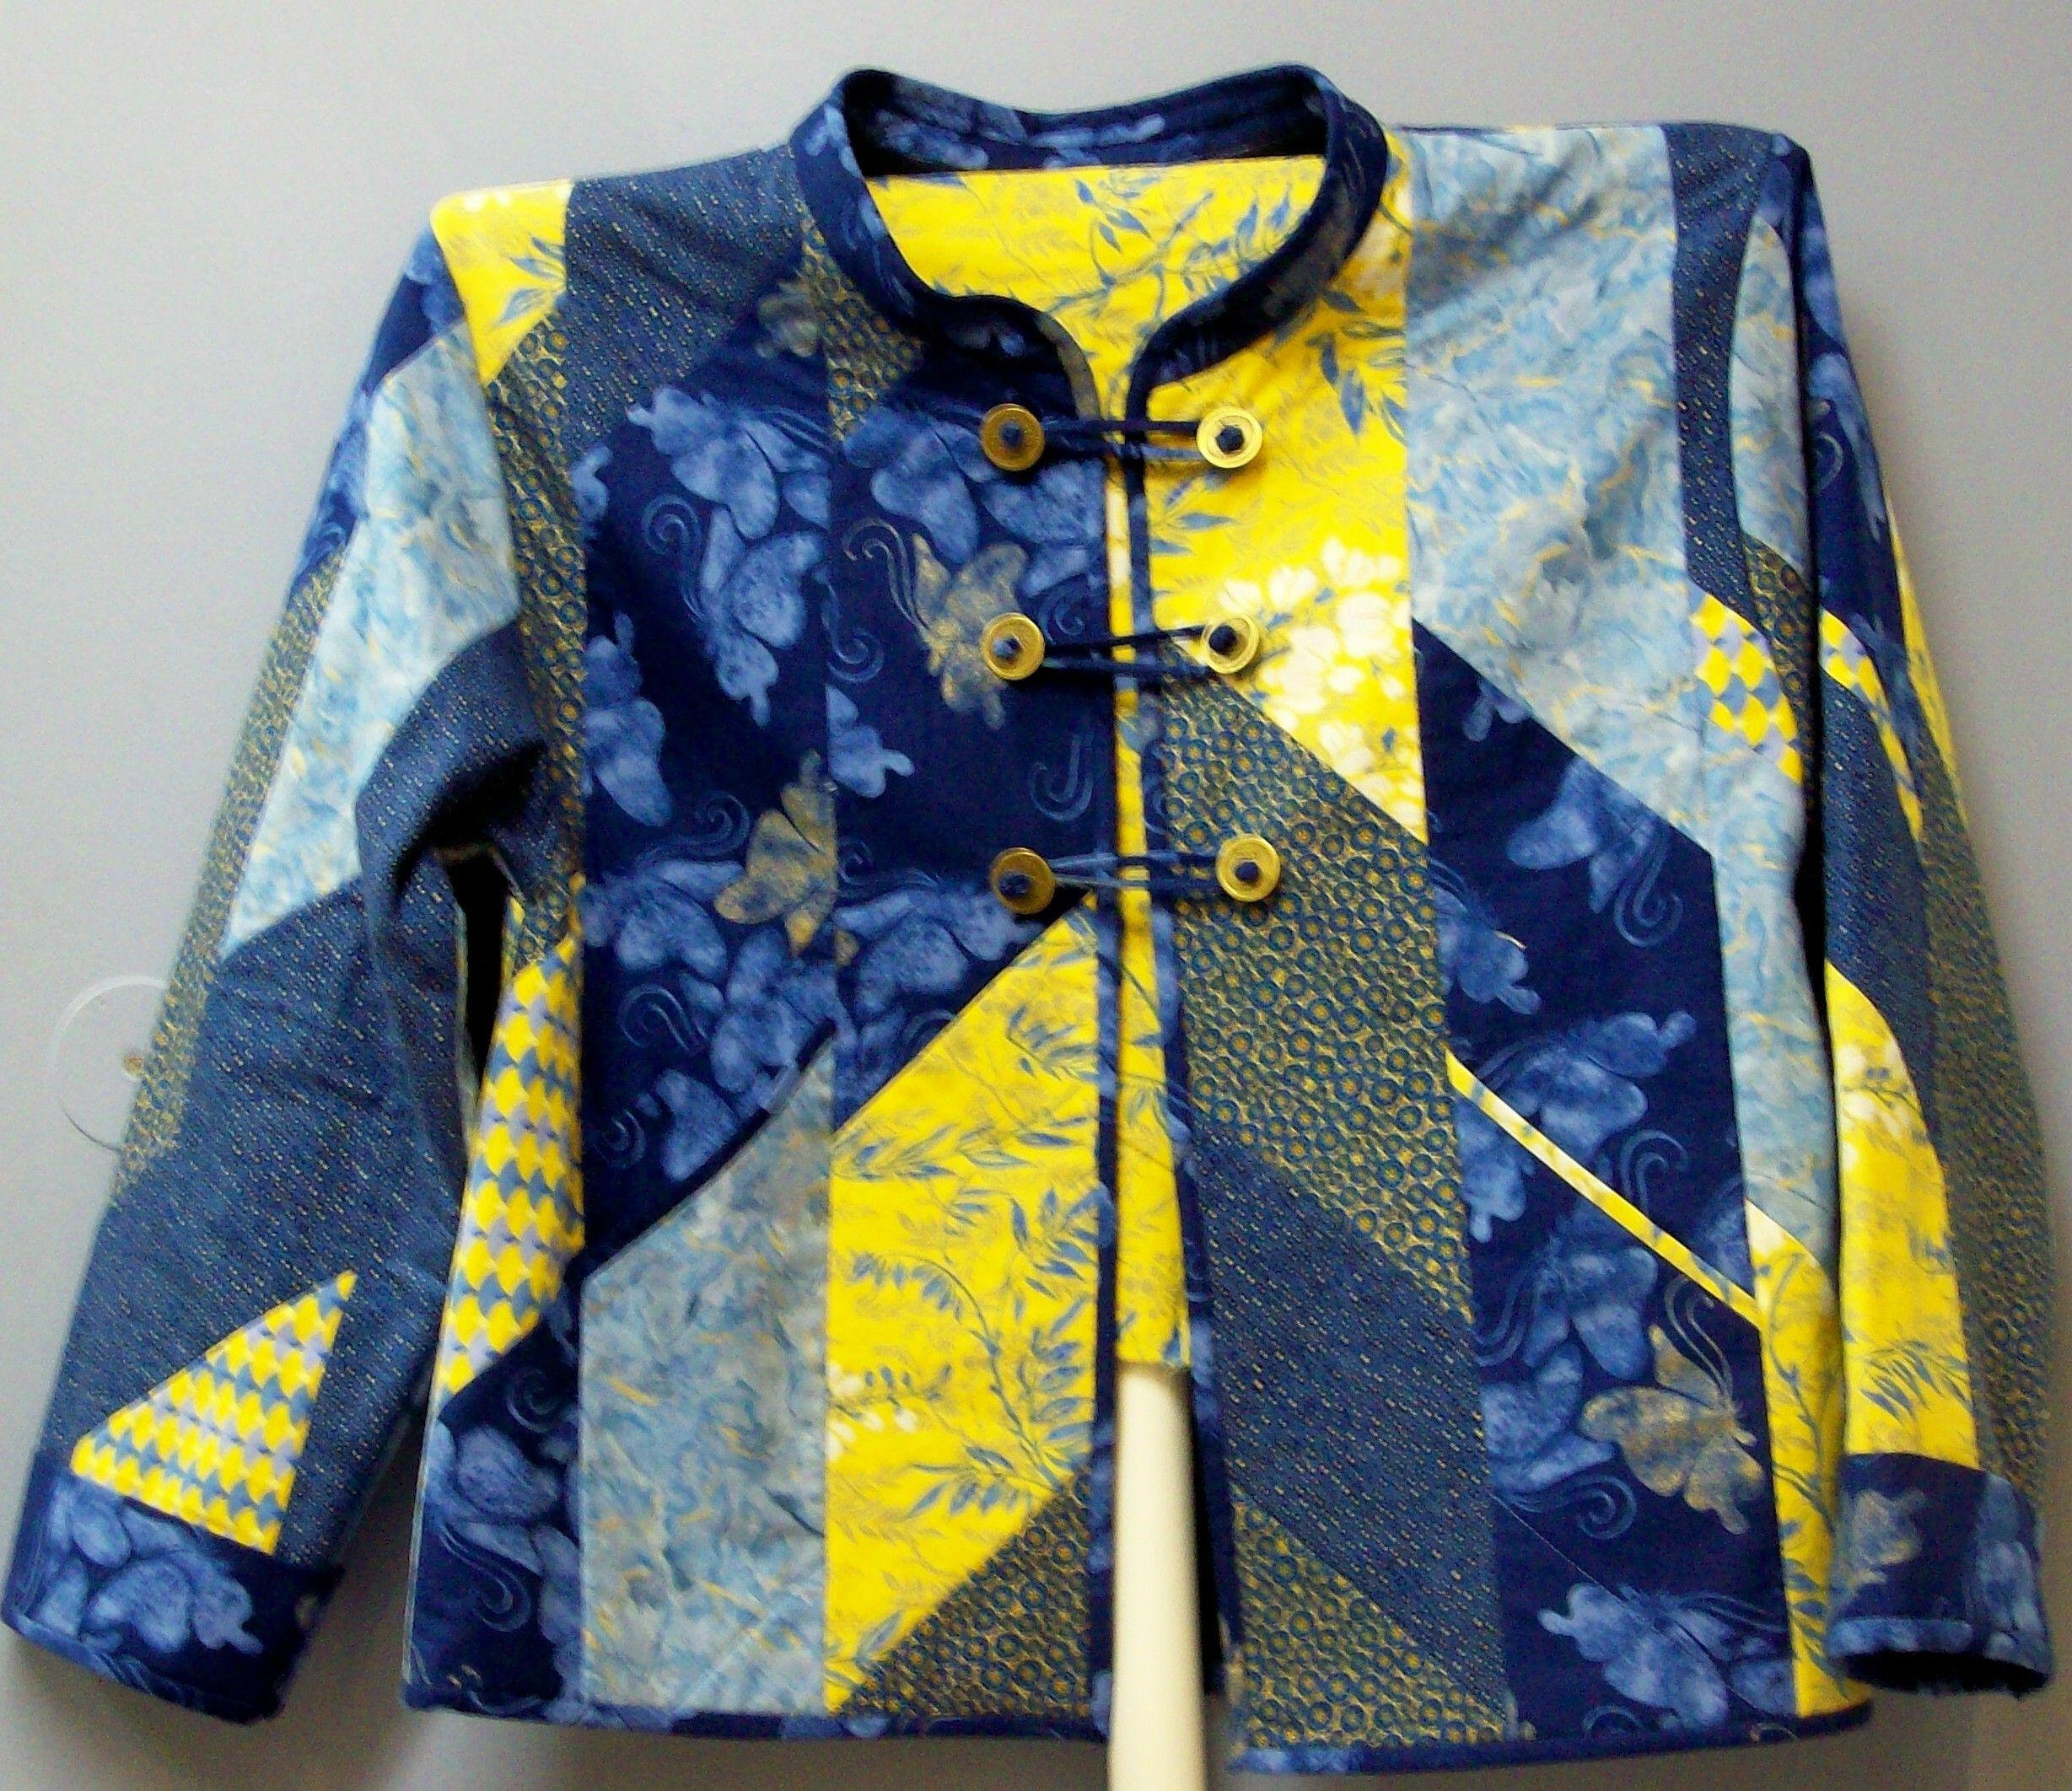 25+ unique Quilted sweatshirt jacket ideas on Pinterest Sweatshirt jackets diy, Sweatshirt ...